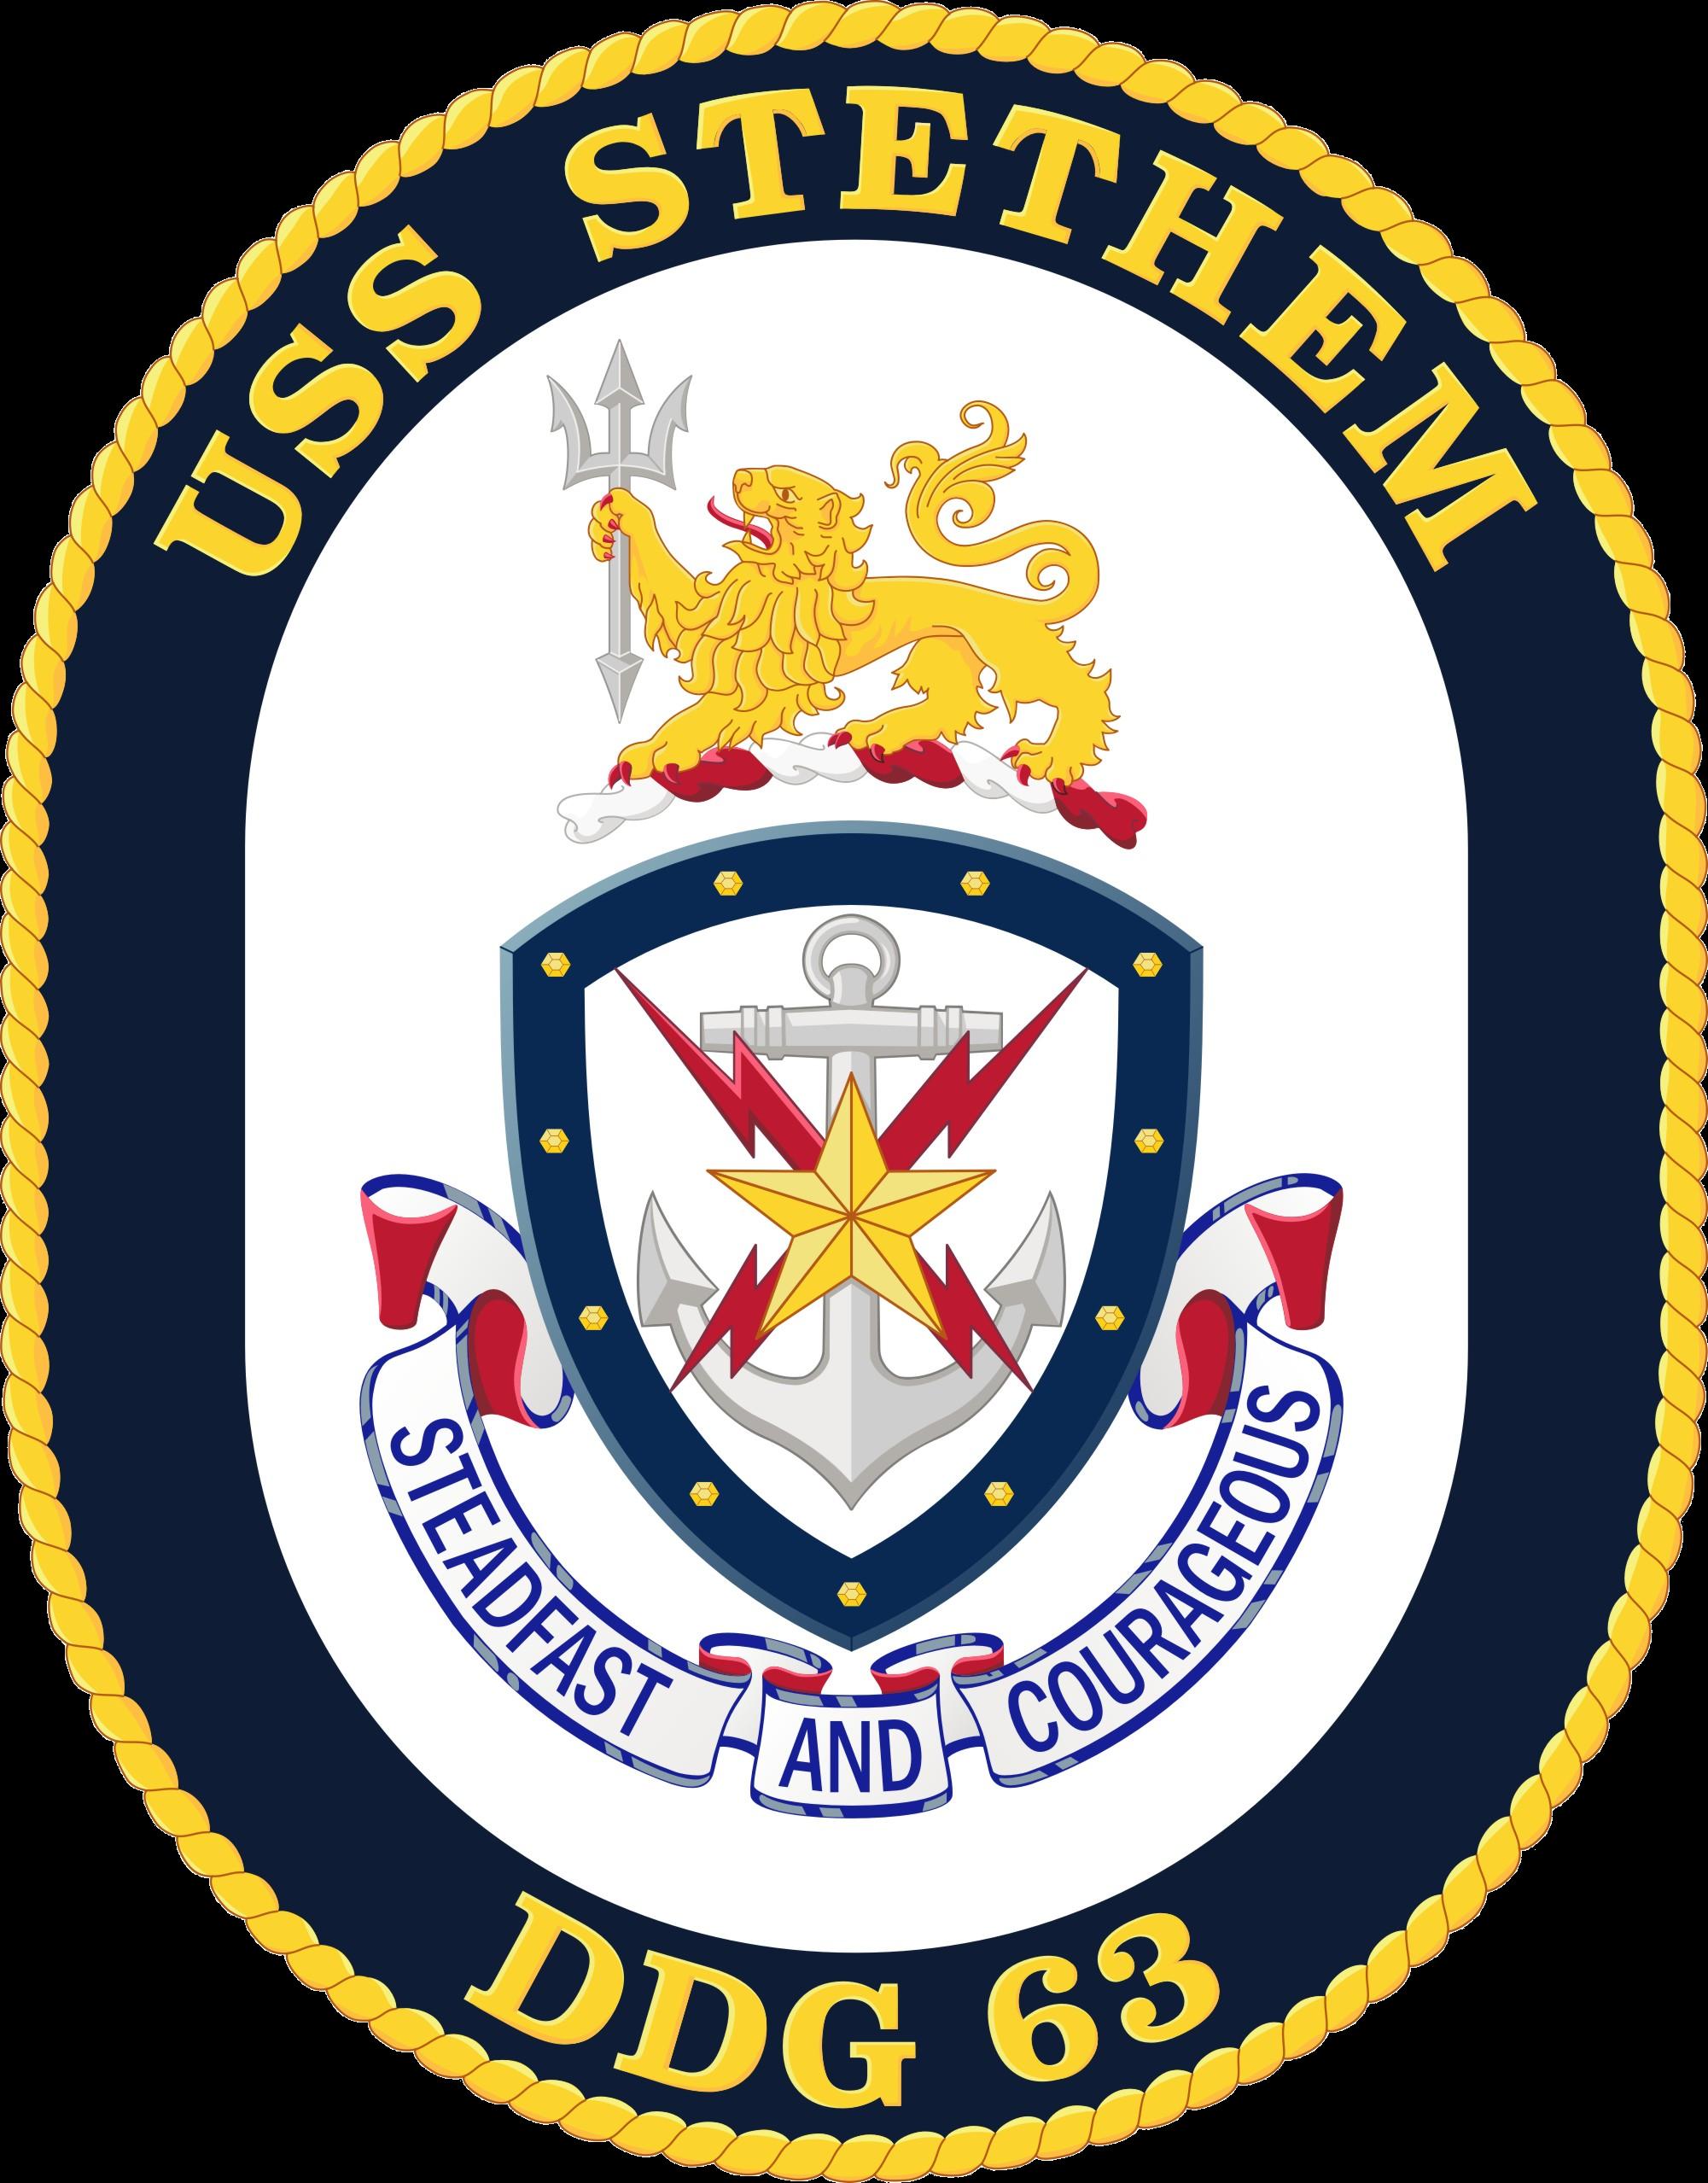 USS Stethem DDG-63 Crest.png